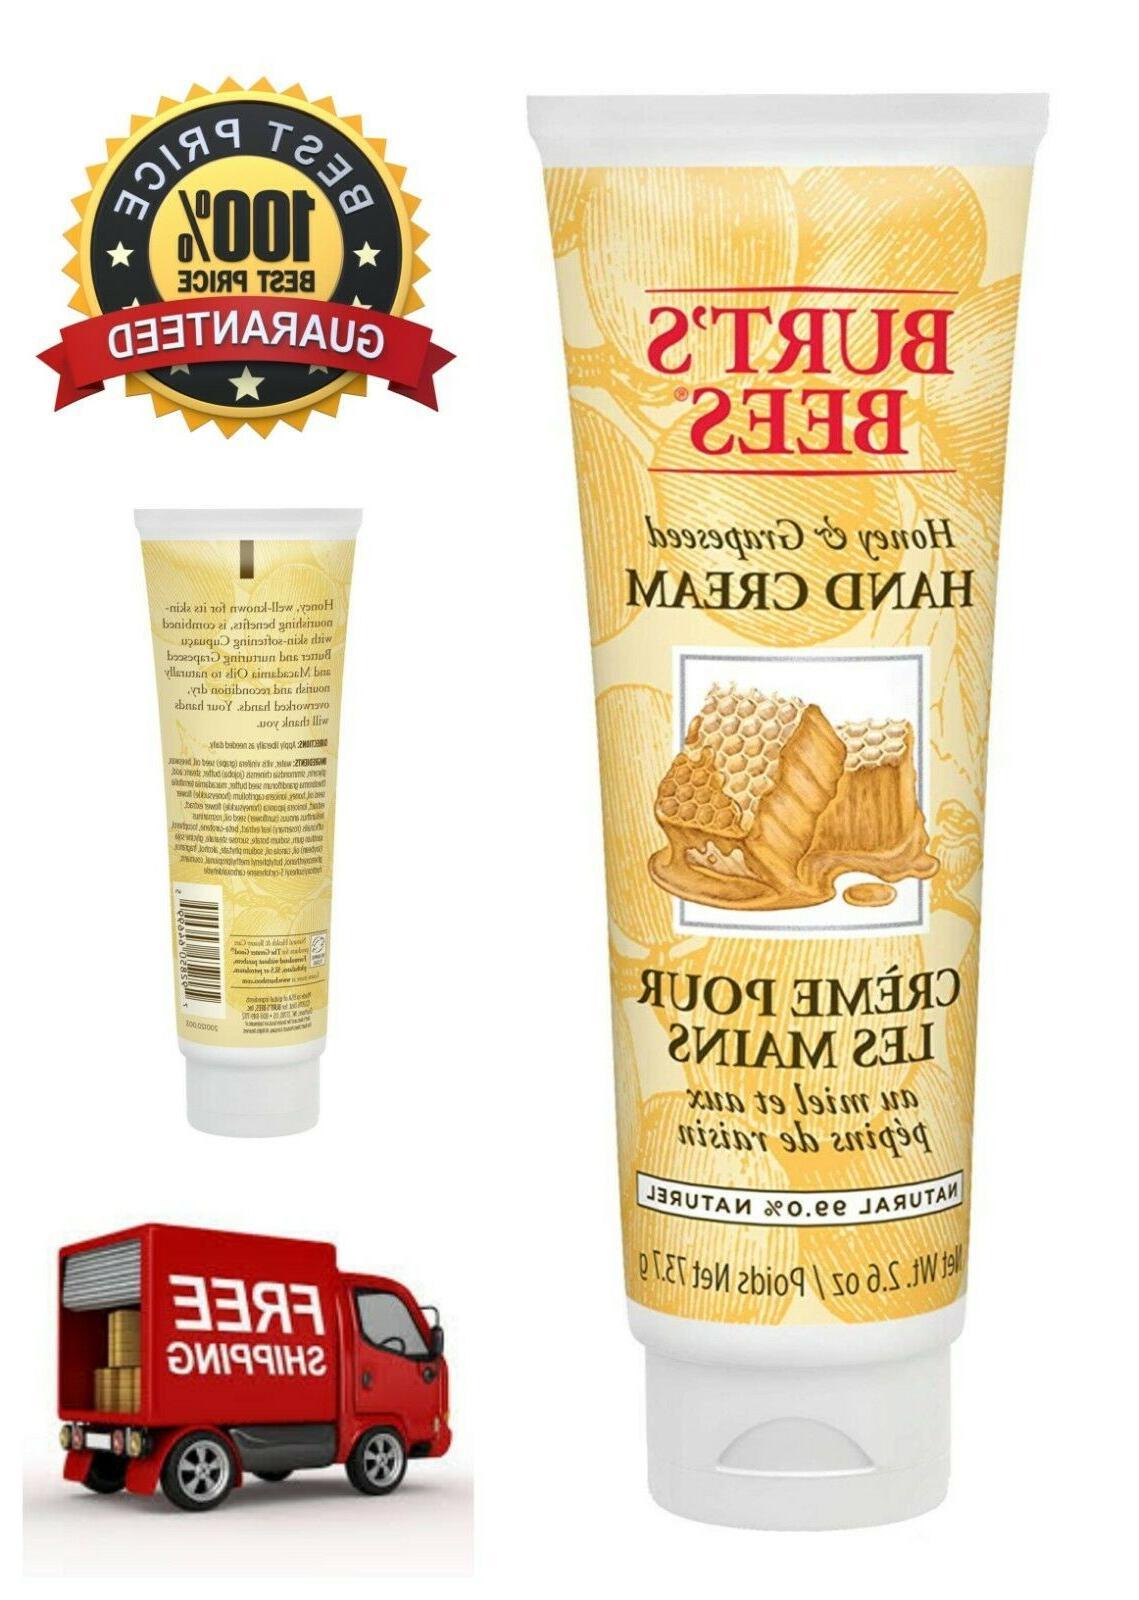 Burt's Bees Honey & Grapeseed Hand Cream Contains Natural Ho